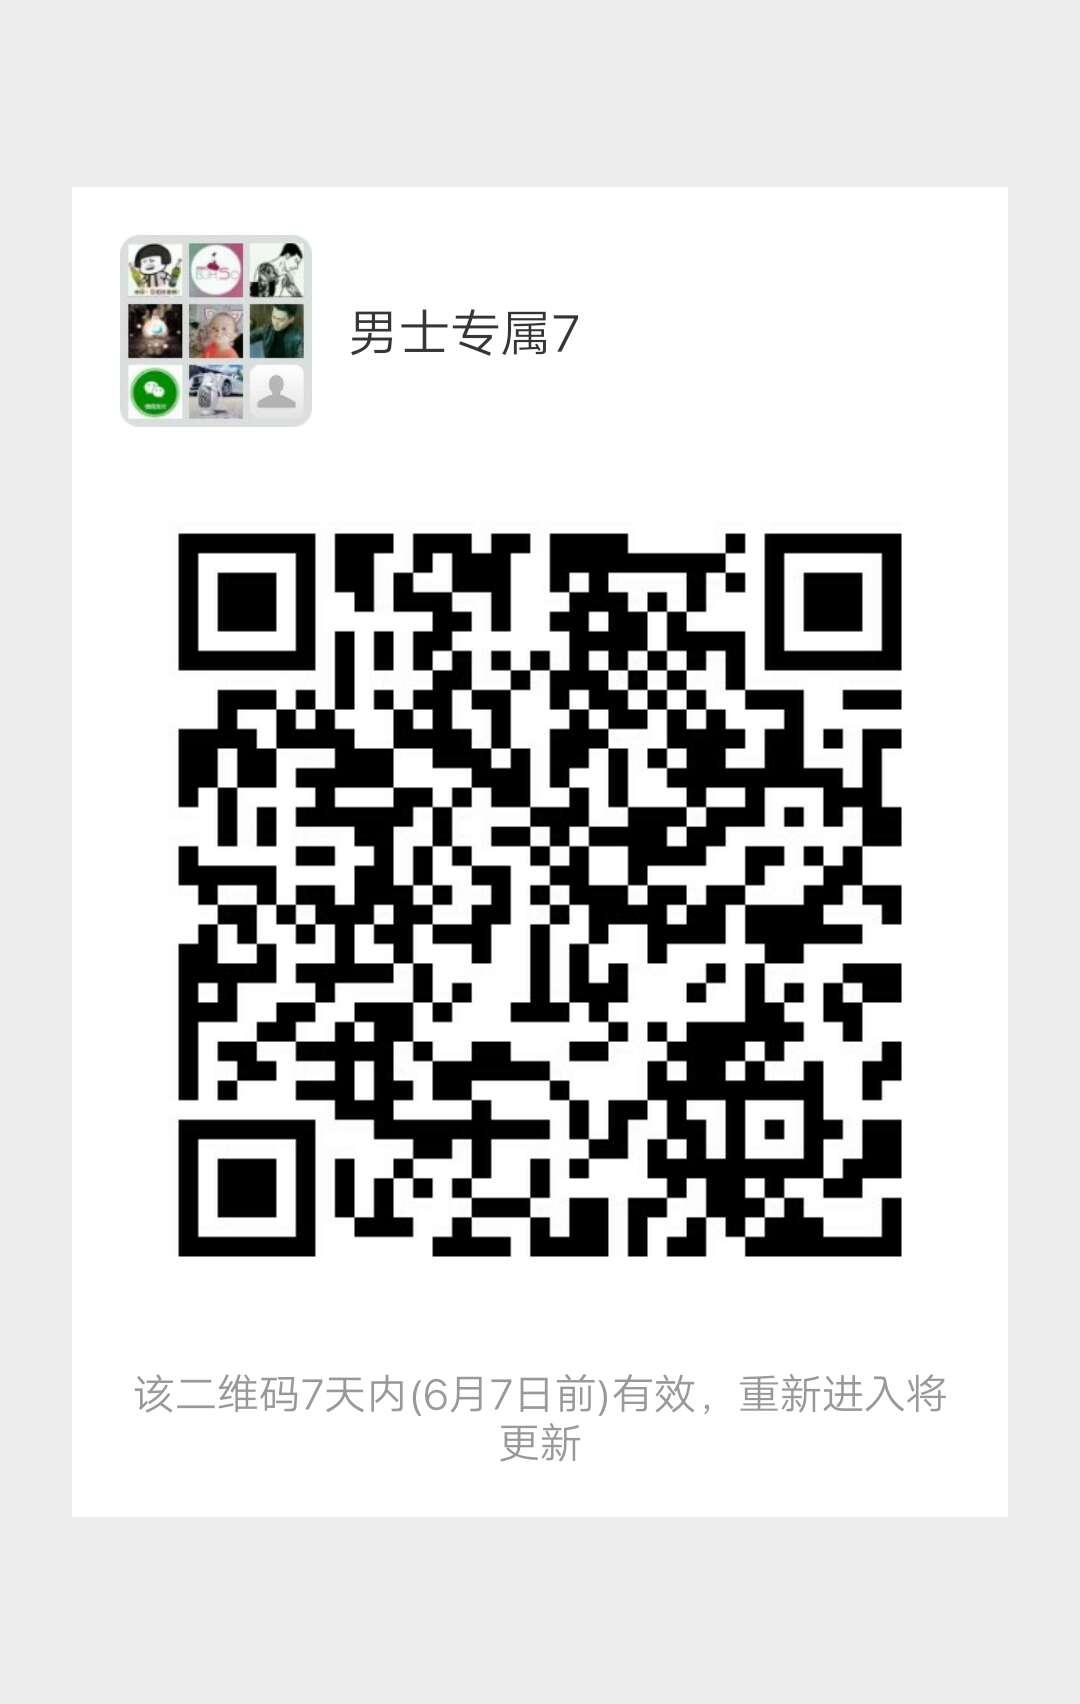 青娱乐wwwqylenetwwwqyle2comwww997sscom